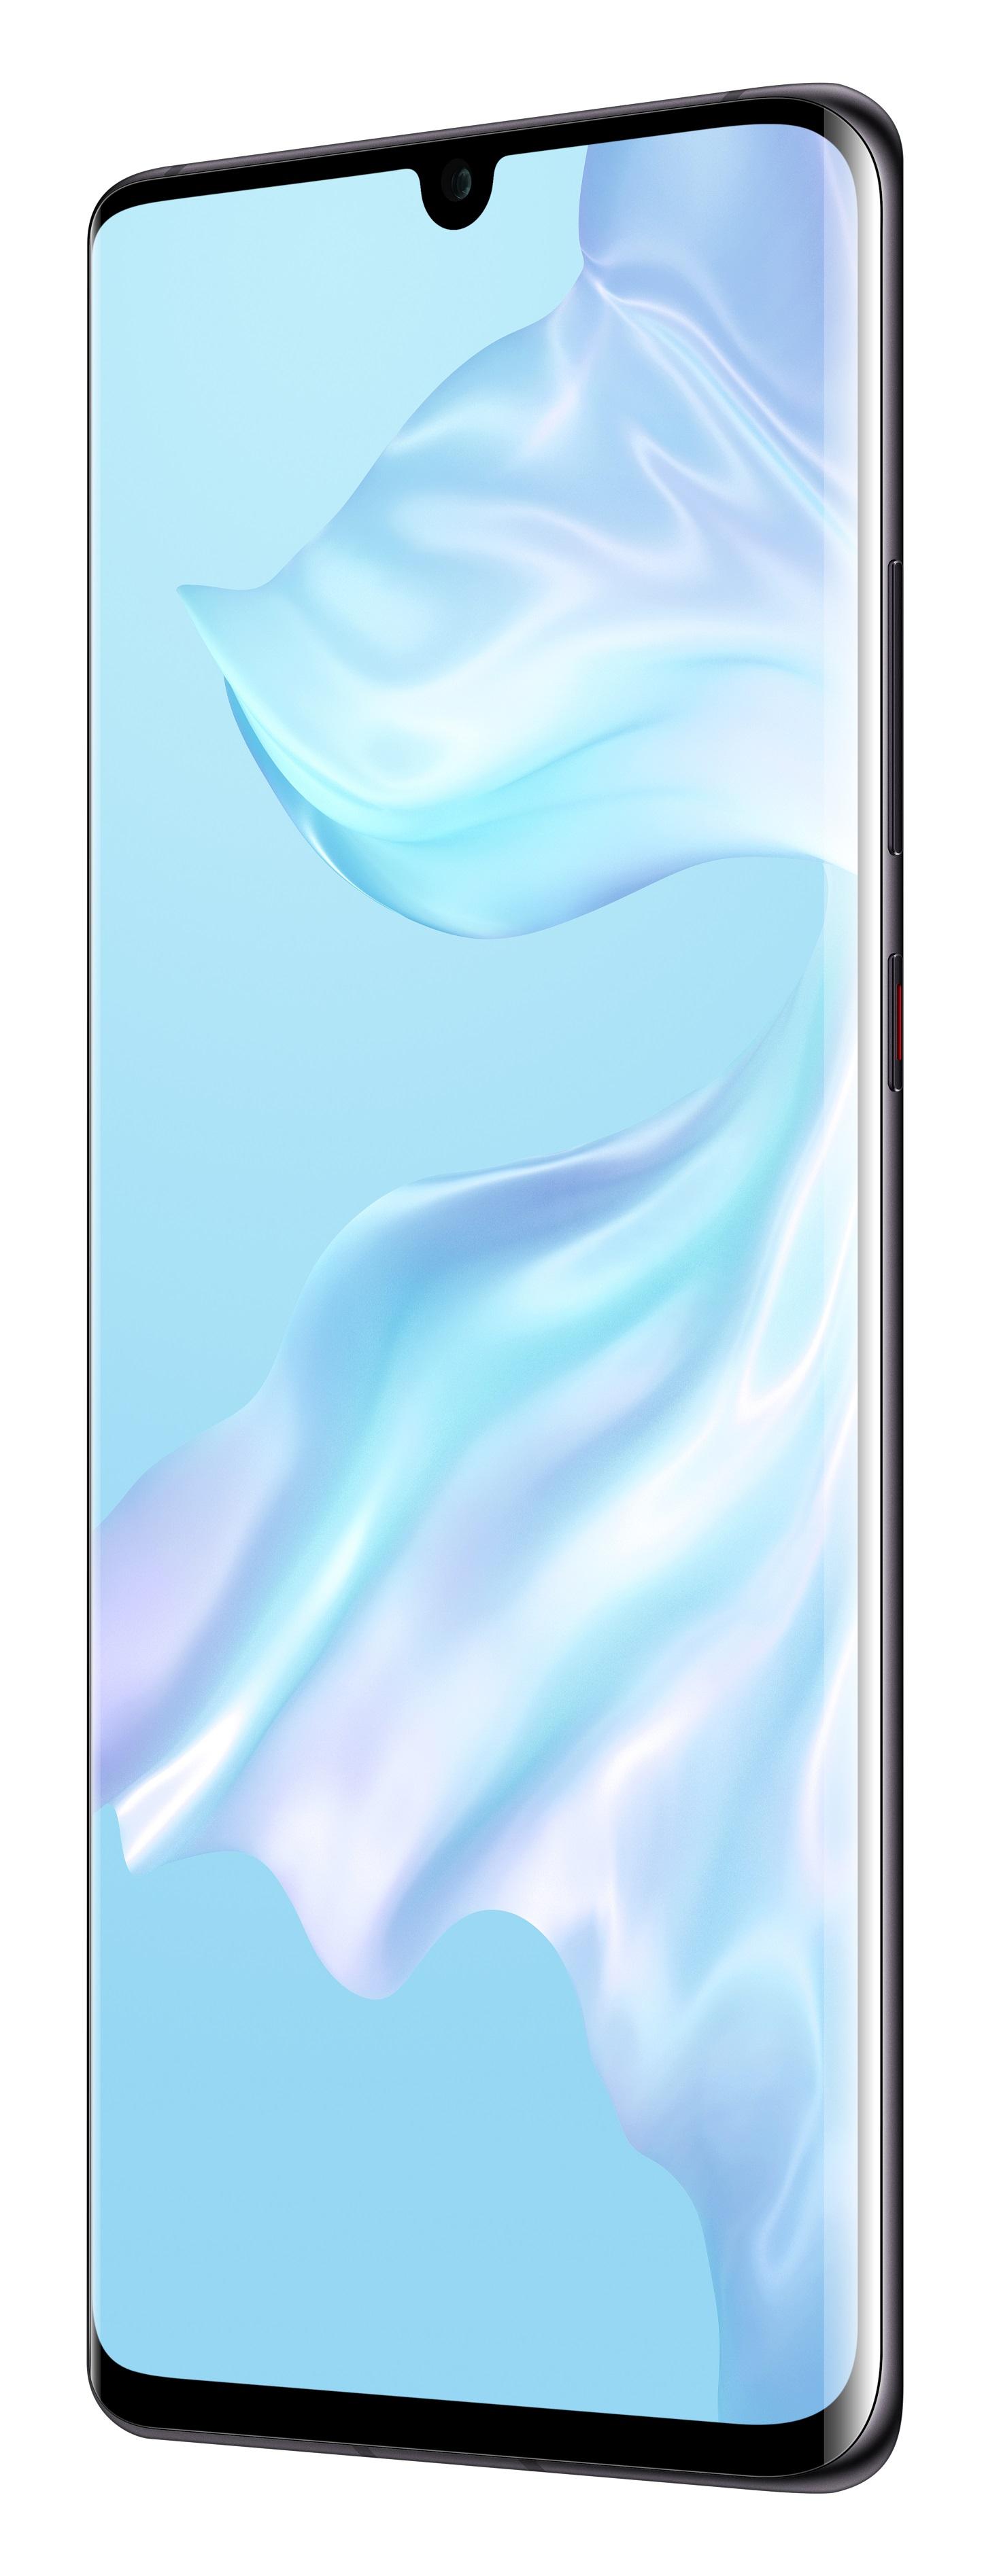 Huawei P30 Pro 256GB schwarz Telekom - Dual SIM, Android 9.0 (Pie), BRANDNEU